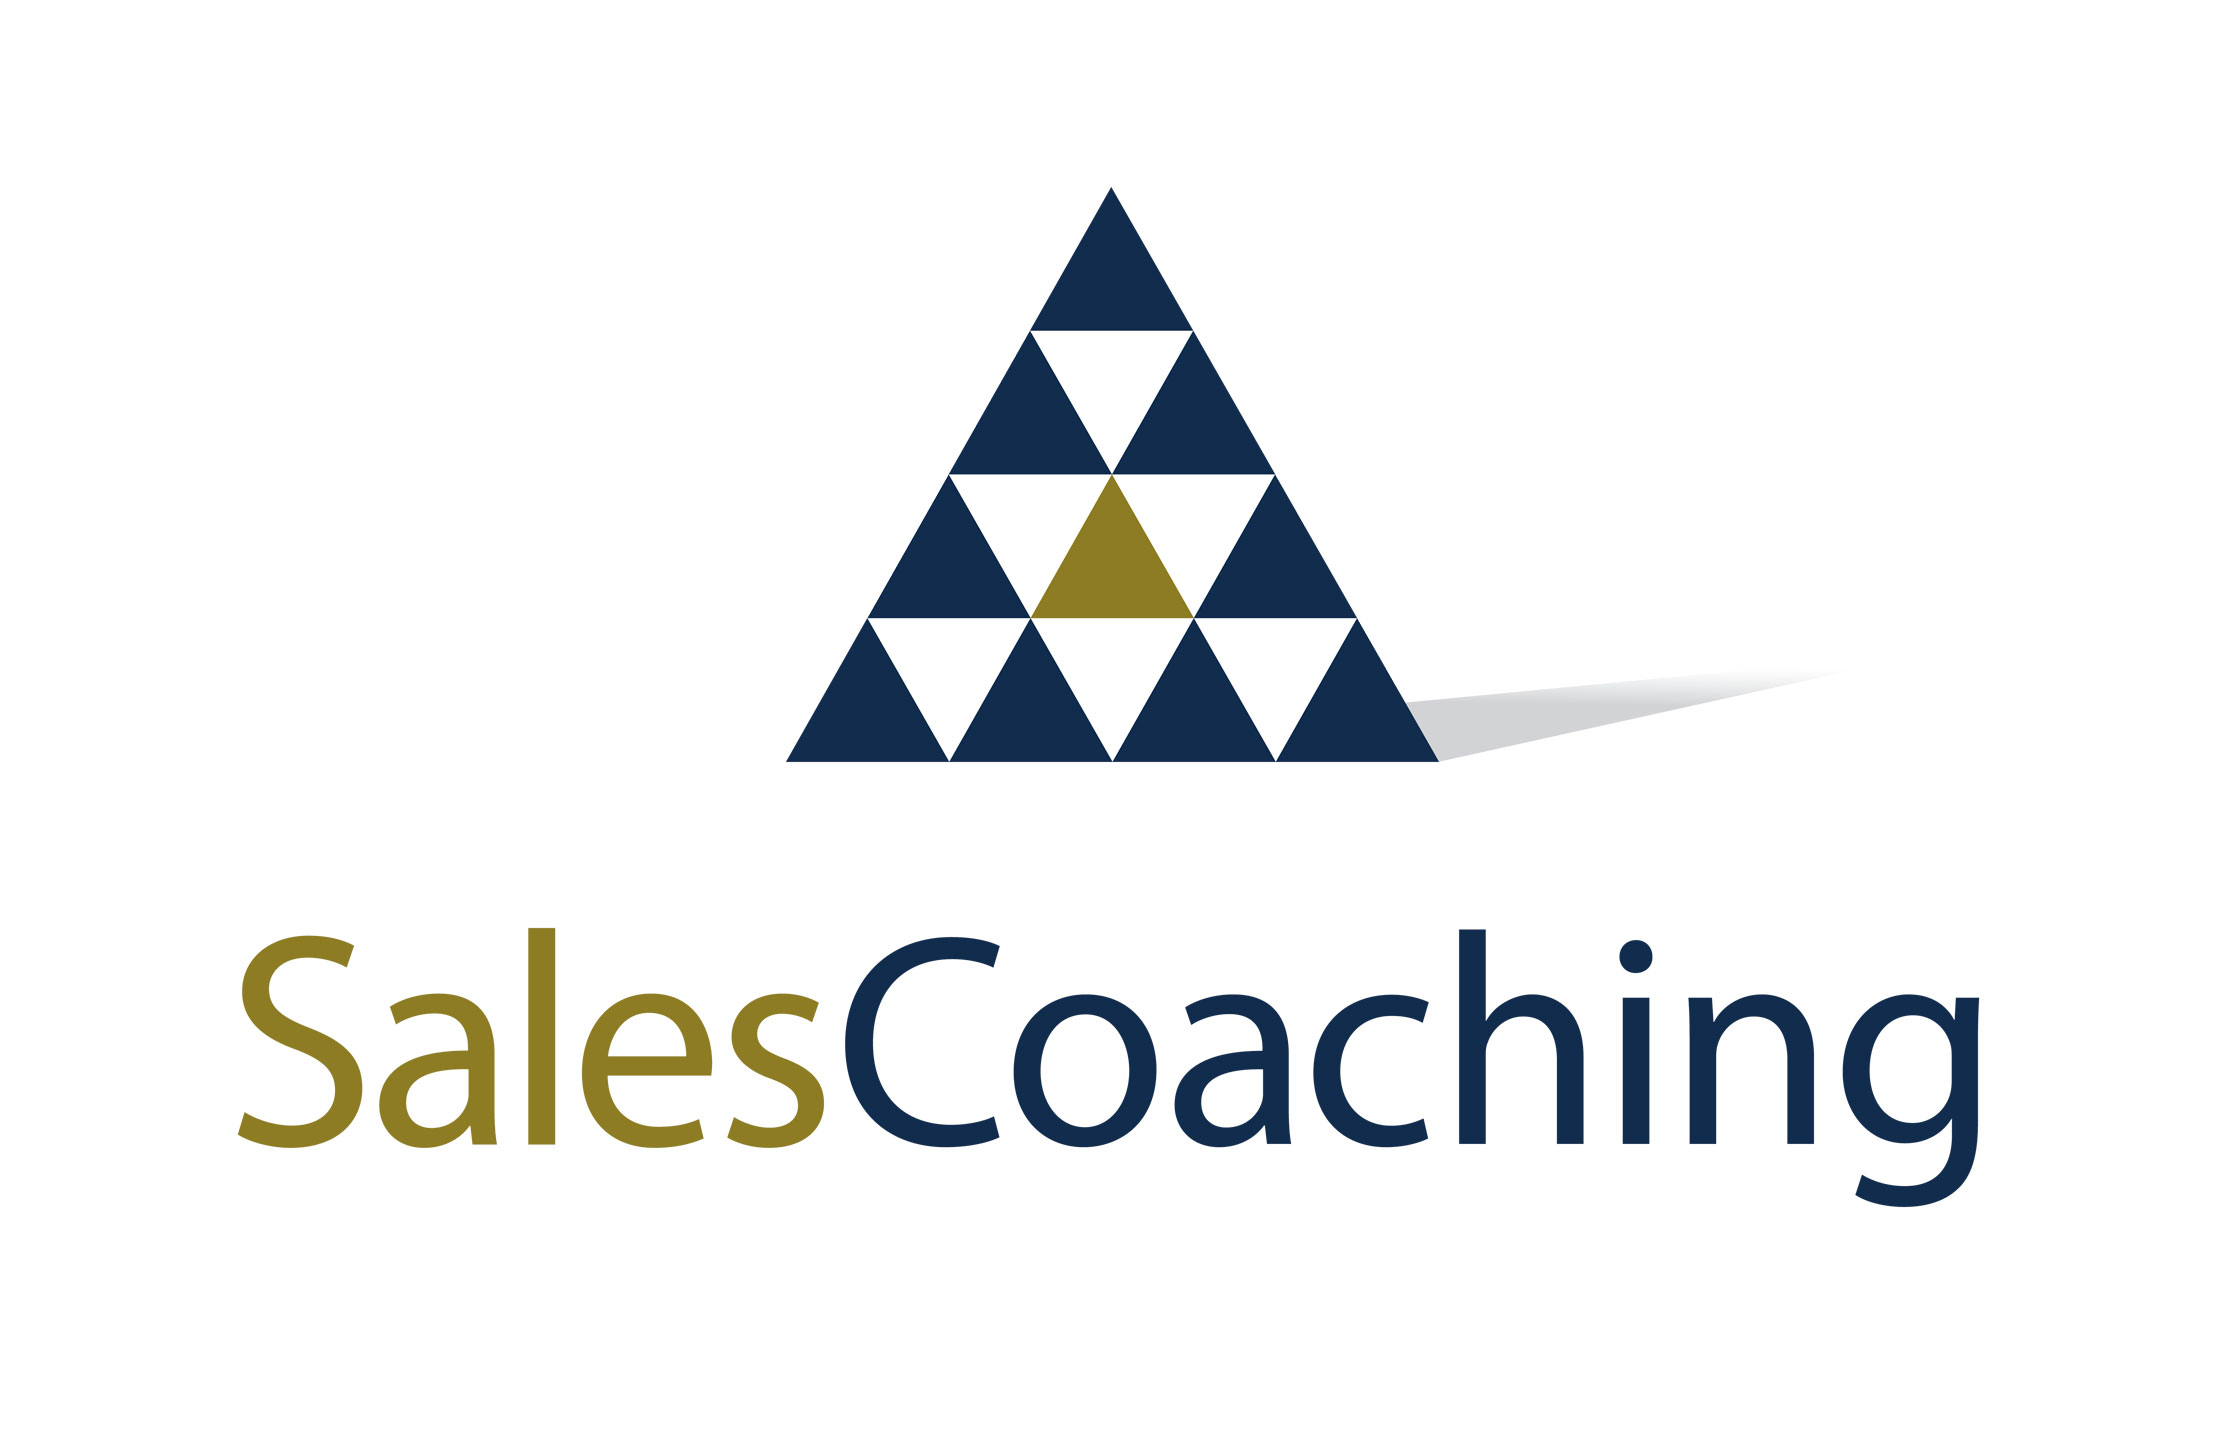 Sales Coaching Limited logo